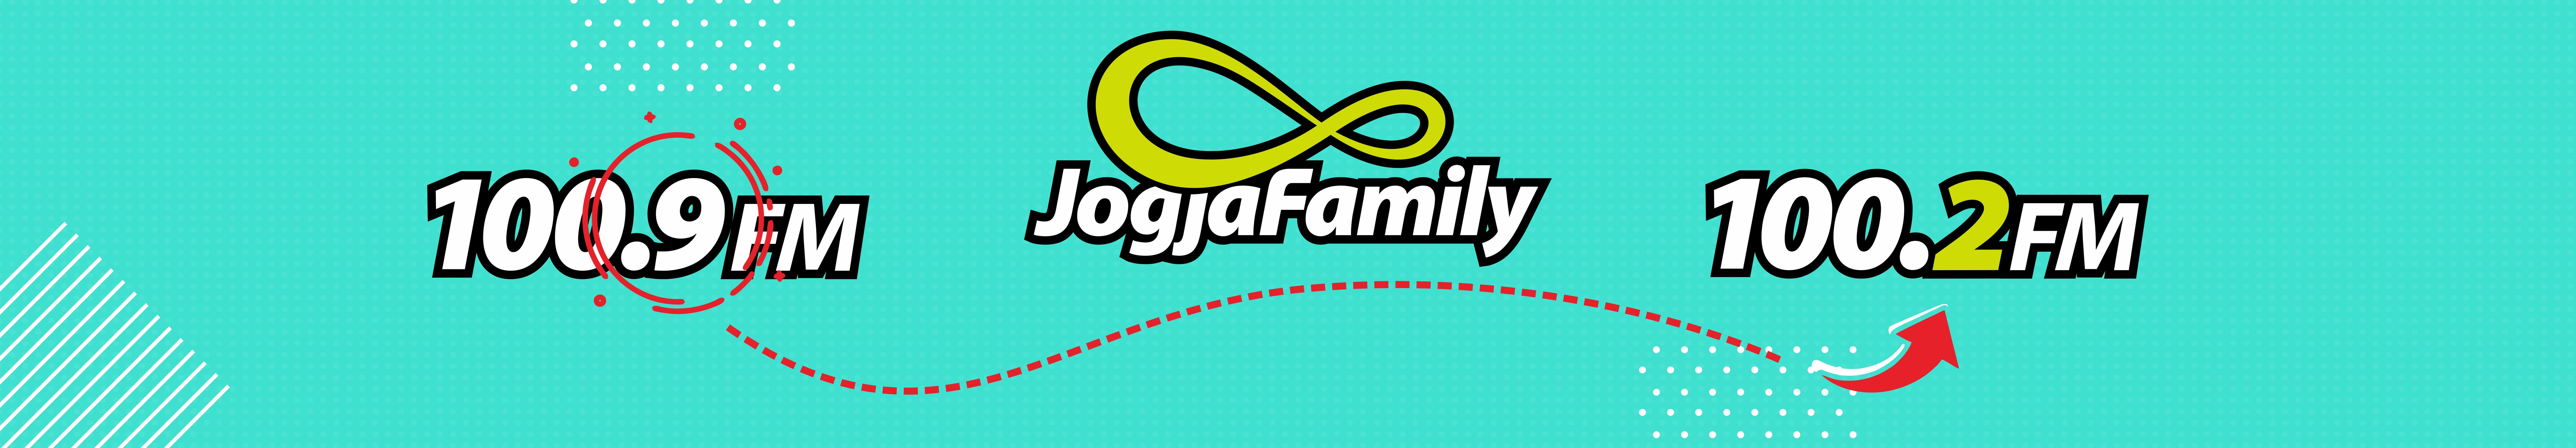 JogjaFamily 100.2 FM